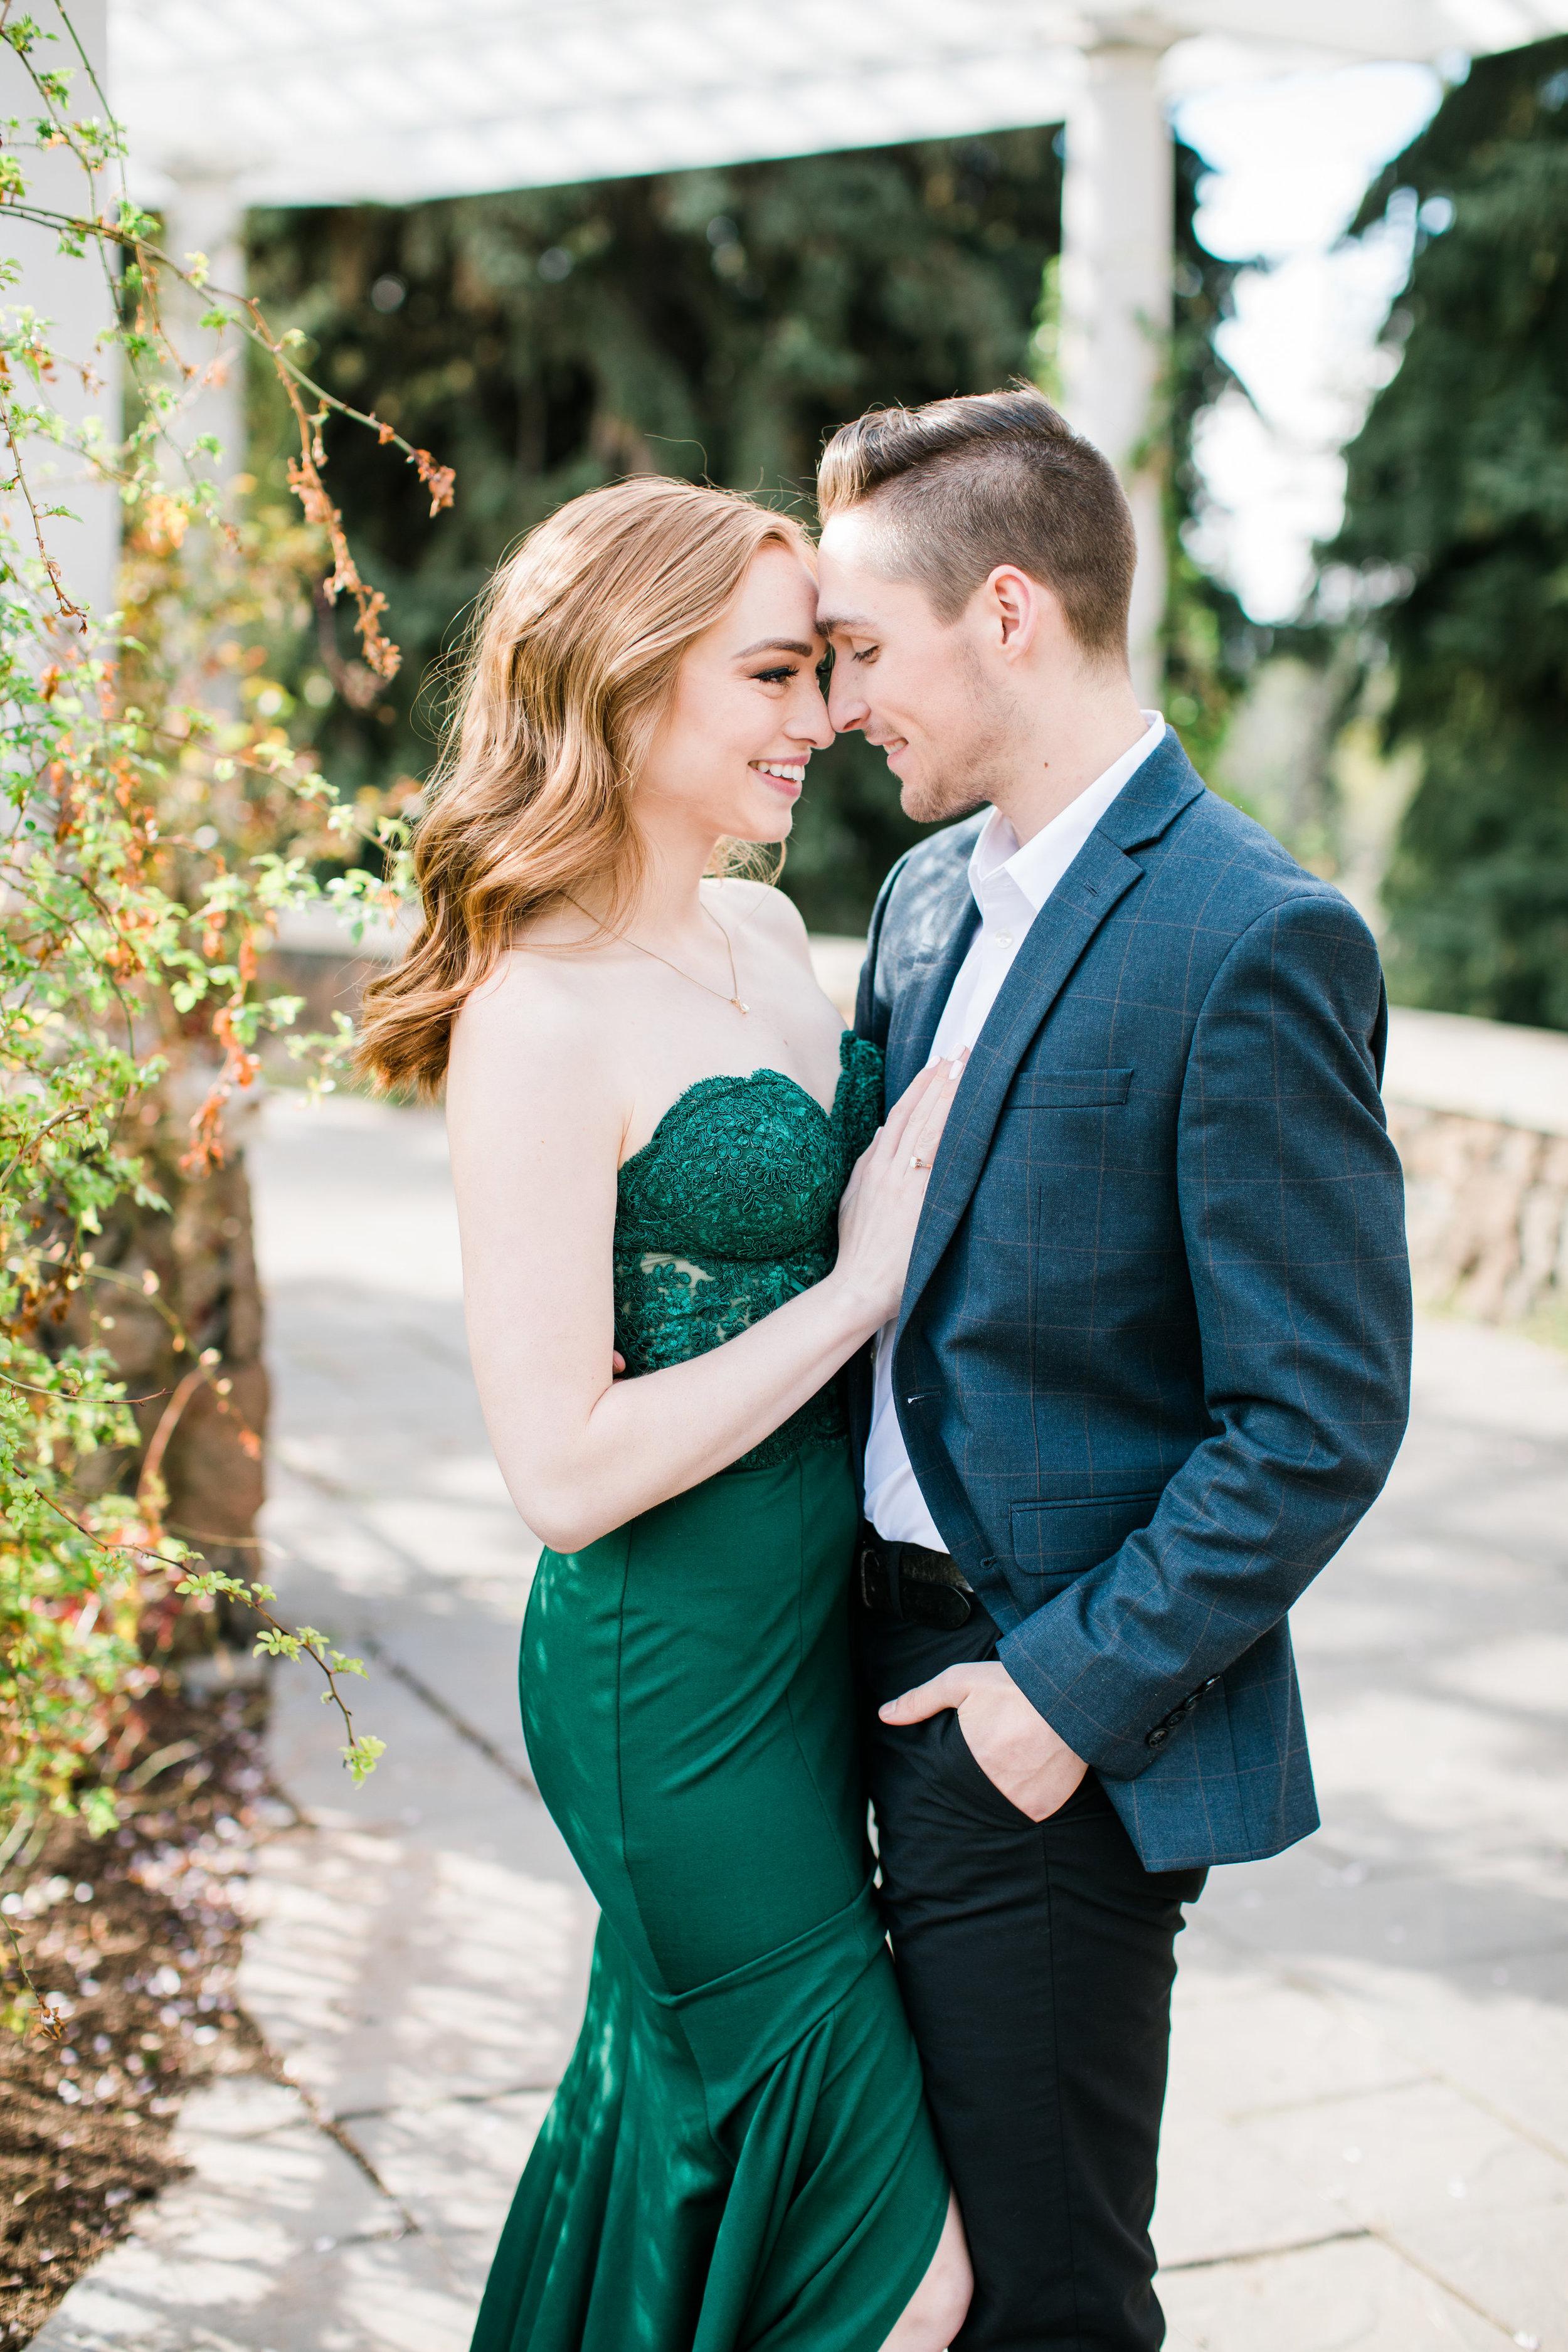 Savannah Jacob Engagement Photos April 27 2019-print preview-0059.jpg